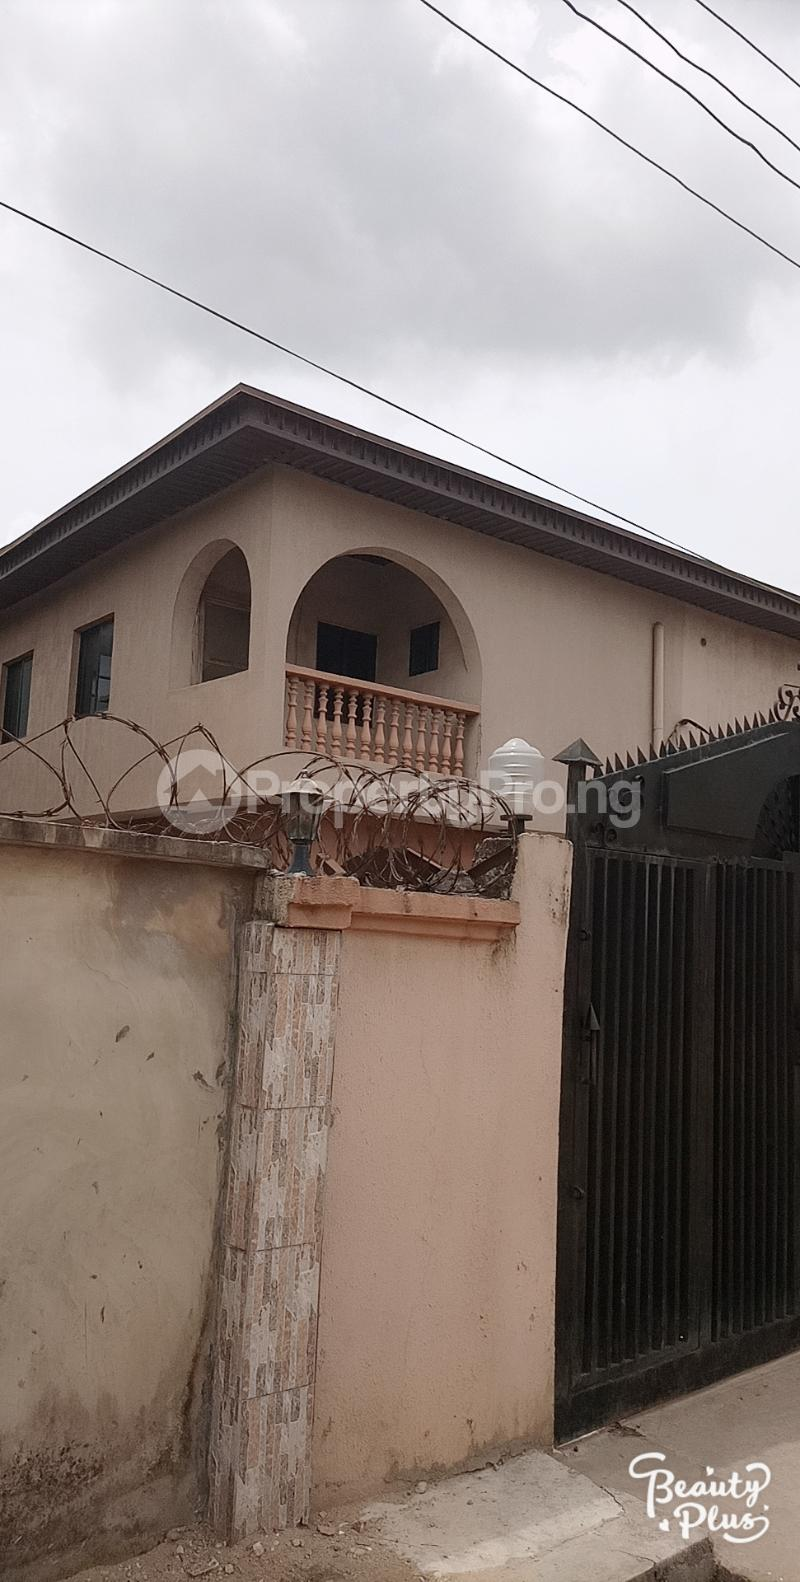 5 bedroom Semi Detached Duplex House for sale Ajao estate Isolo. Lagos Ajao Estate Isolo Lagos - 2